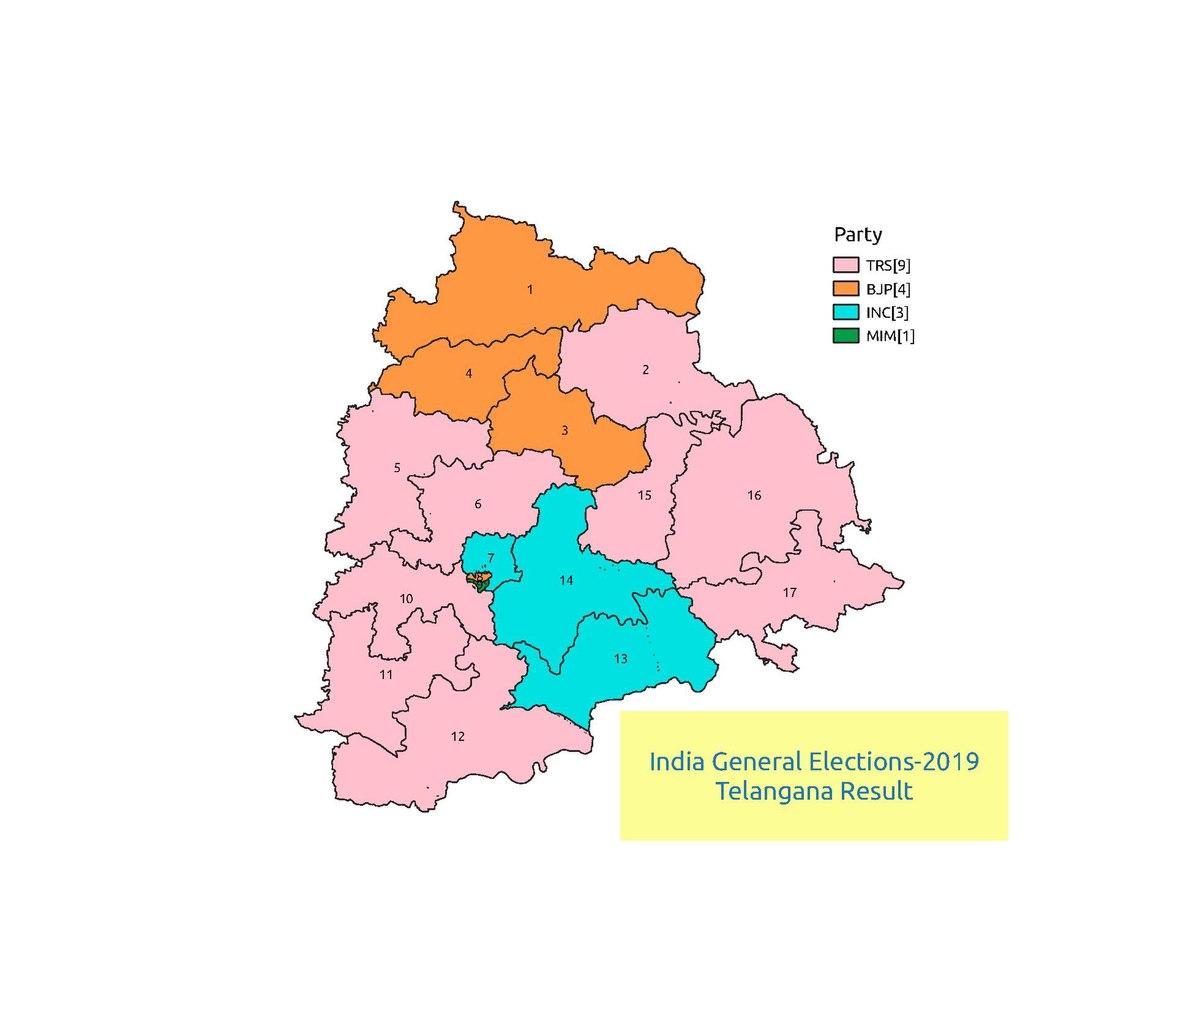 2019 Indian general election in Telangana - Wikipedia